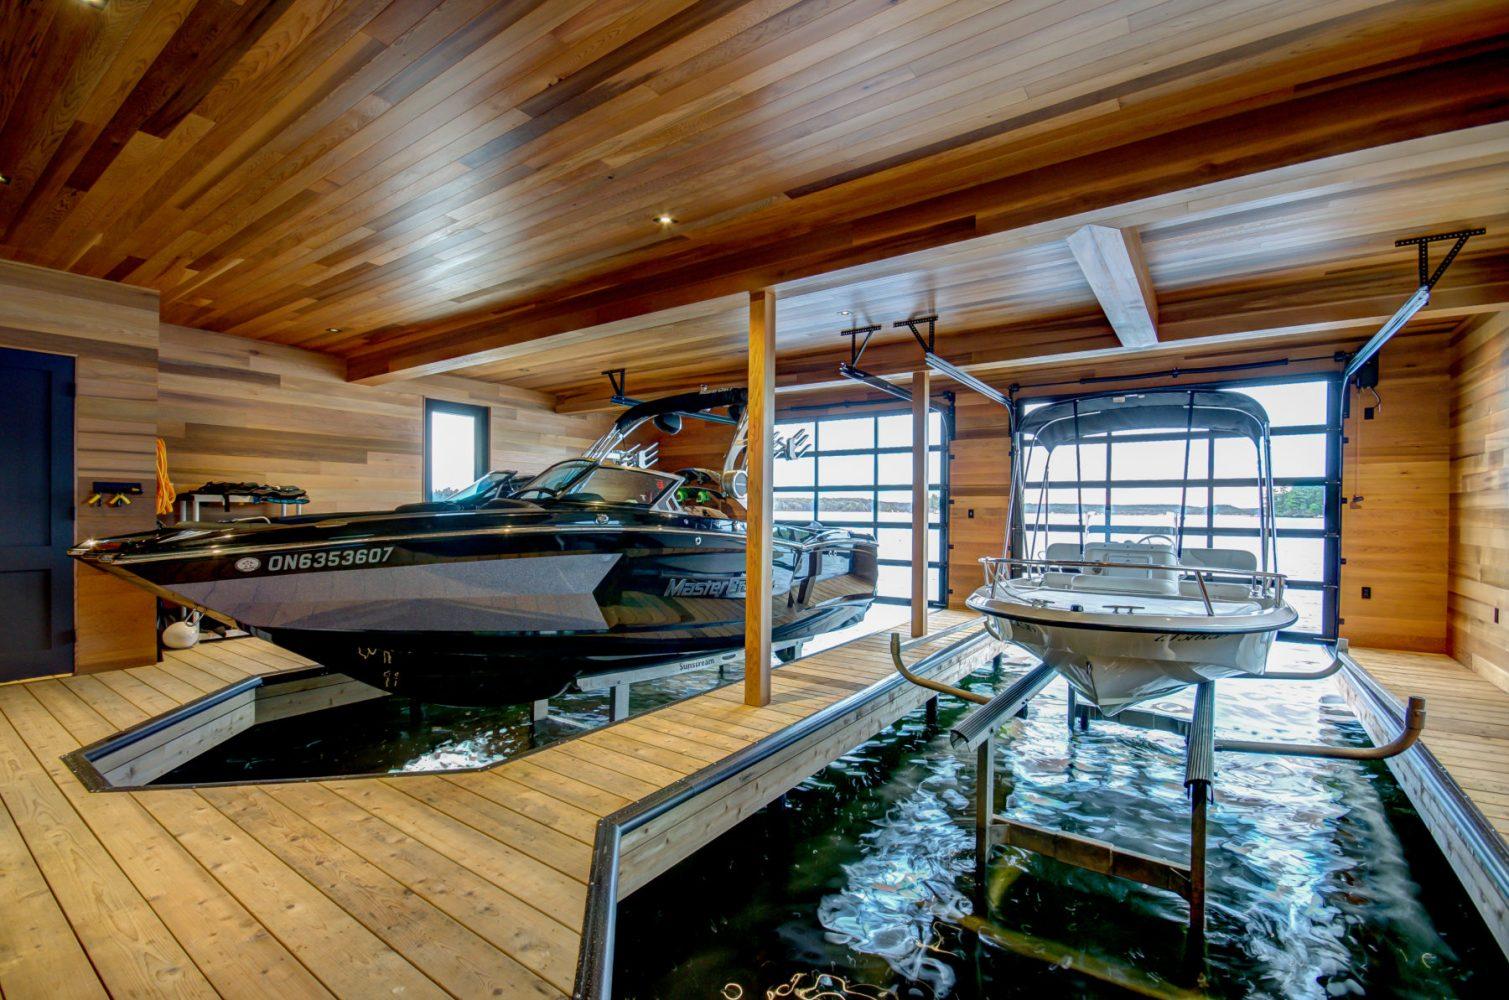 Clear cedar finished boathouse built by PattyMac in Muskoka